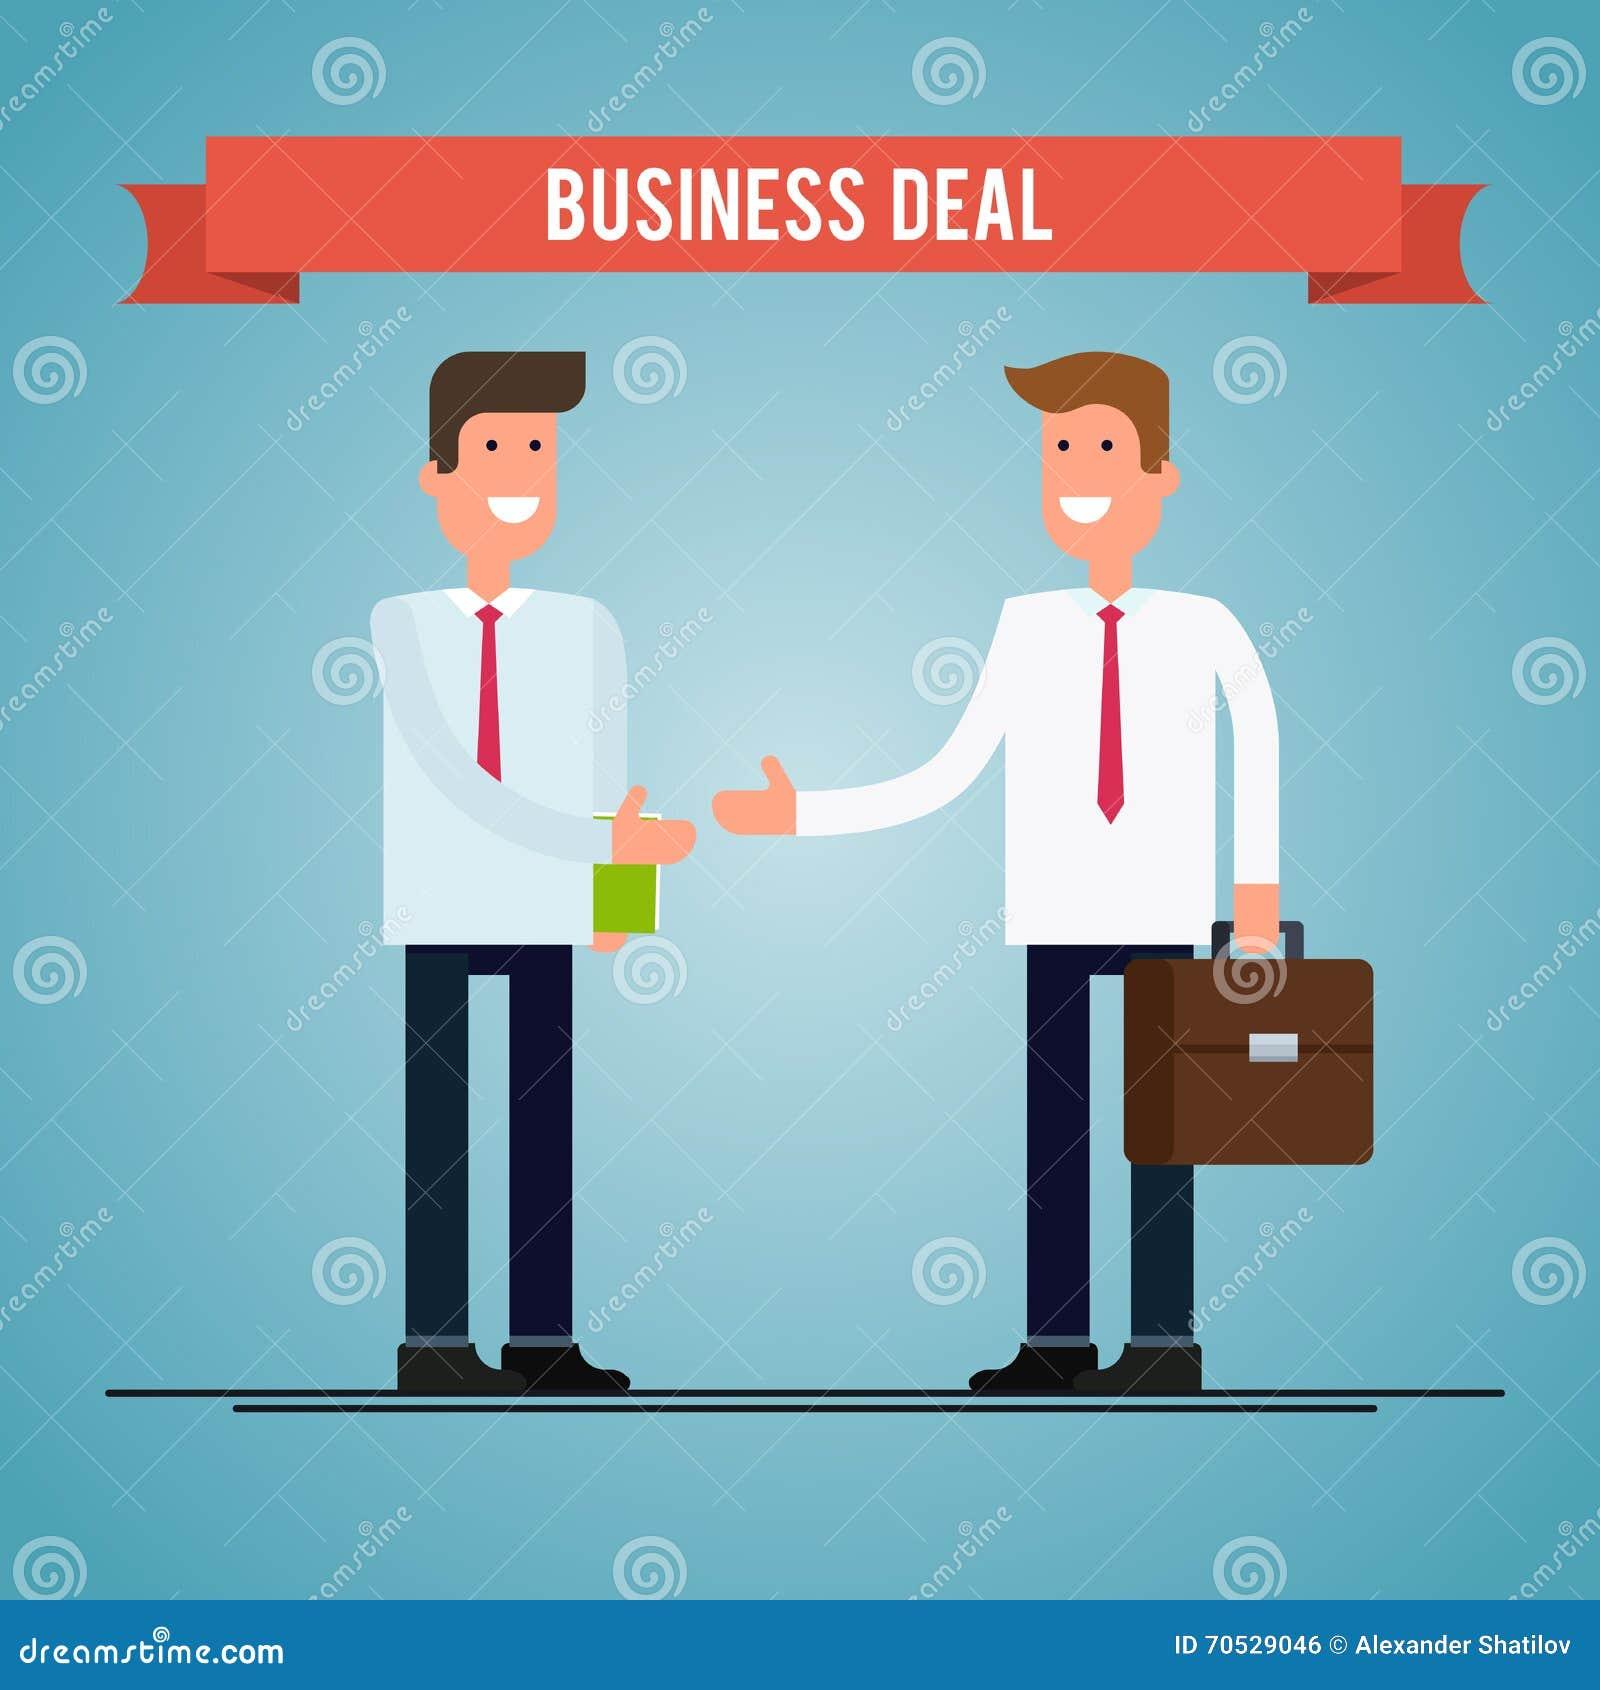 Business Deal People Shaking Hands Vector Flat Illustration Stock Handshake Teamwork